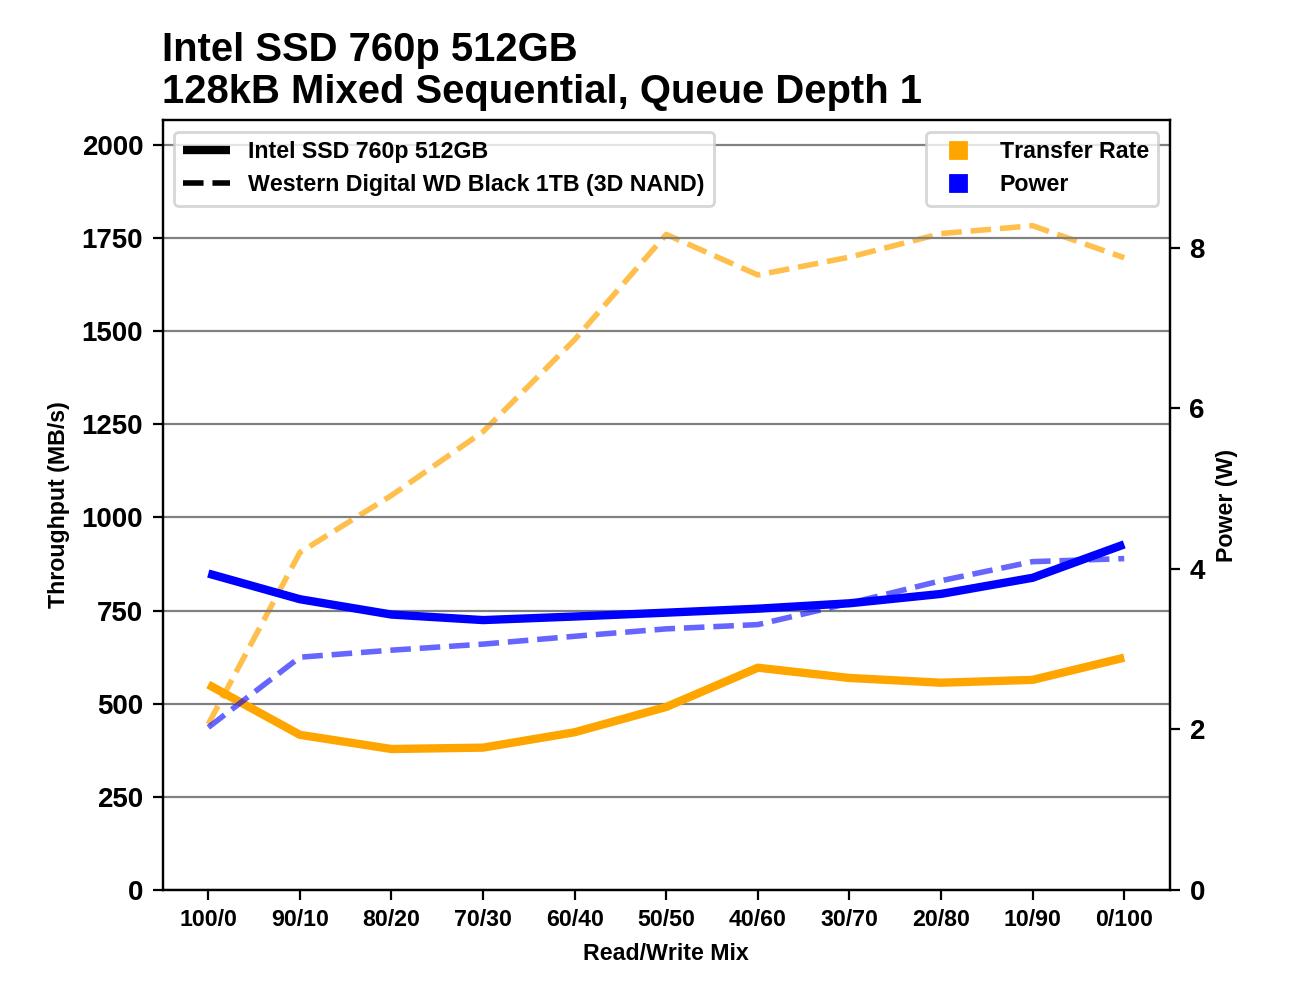 Обзор Western Digital WD Black 3D NAND SSD: EVO встретил равного - 132